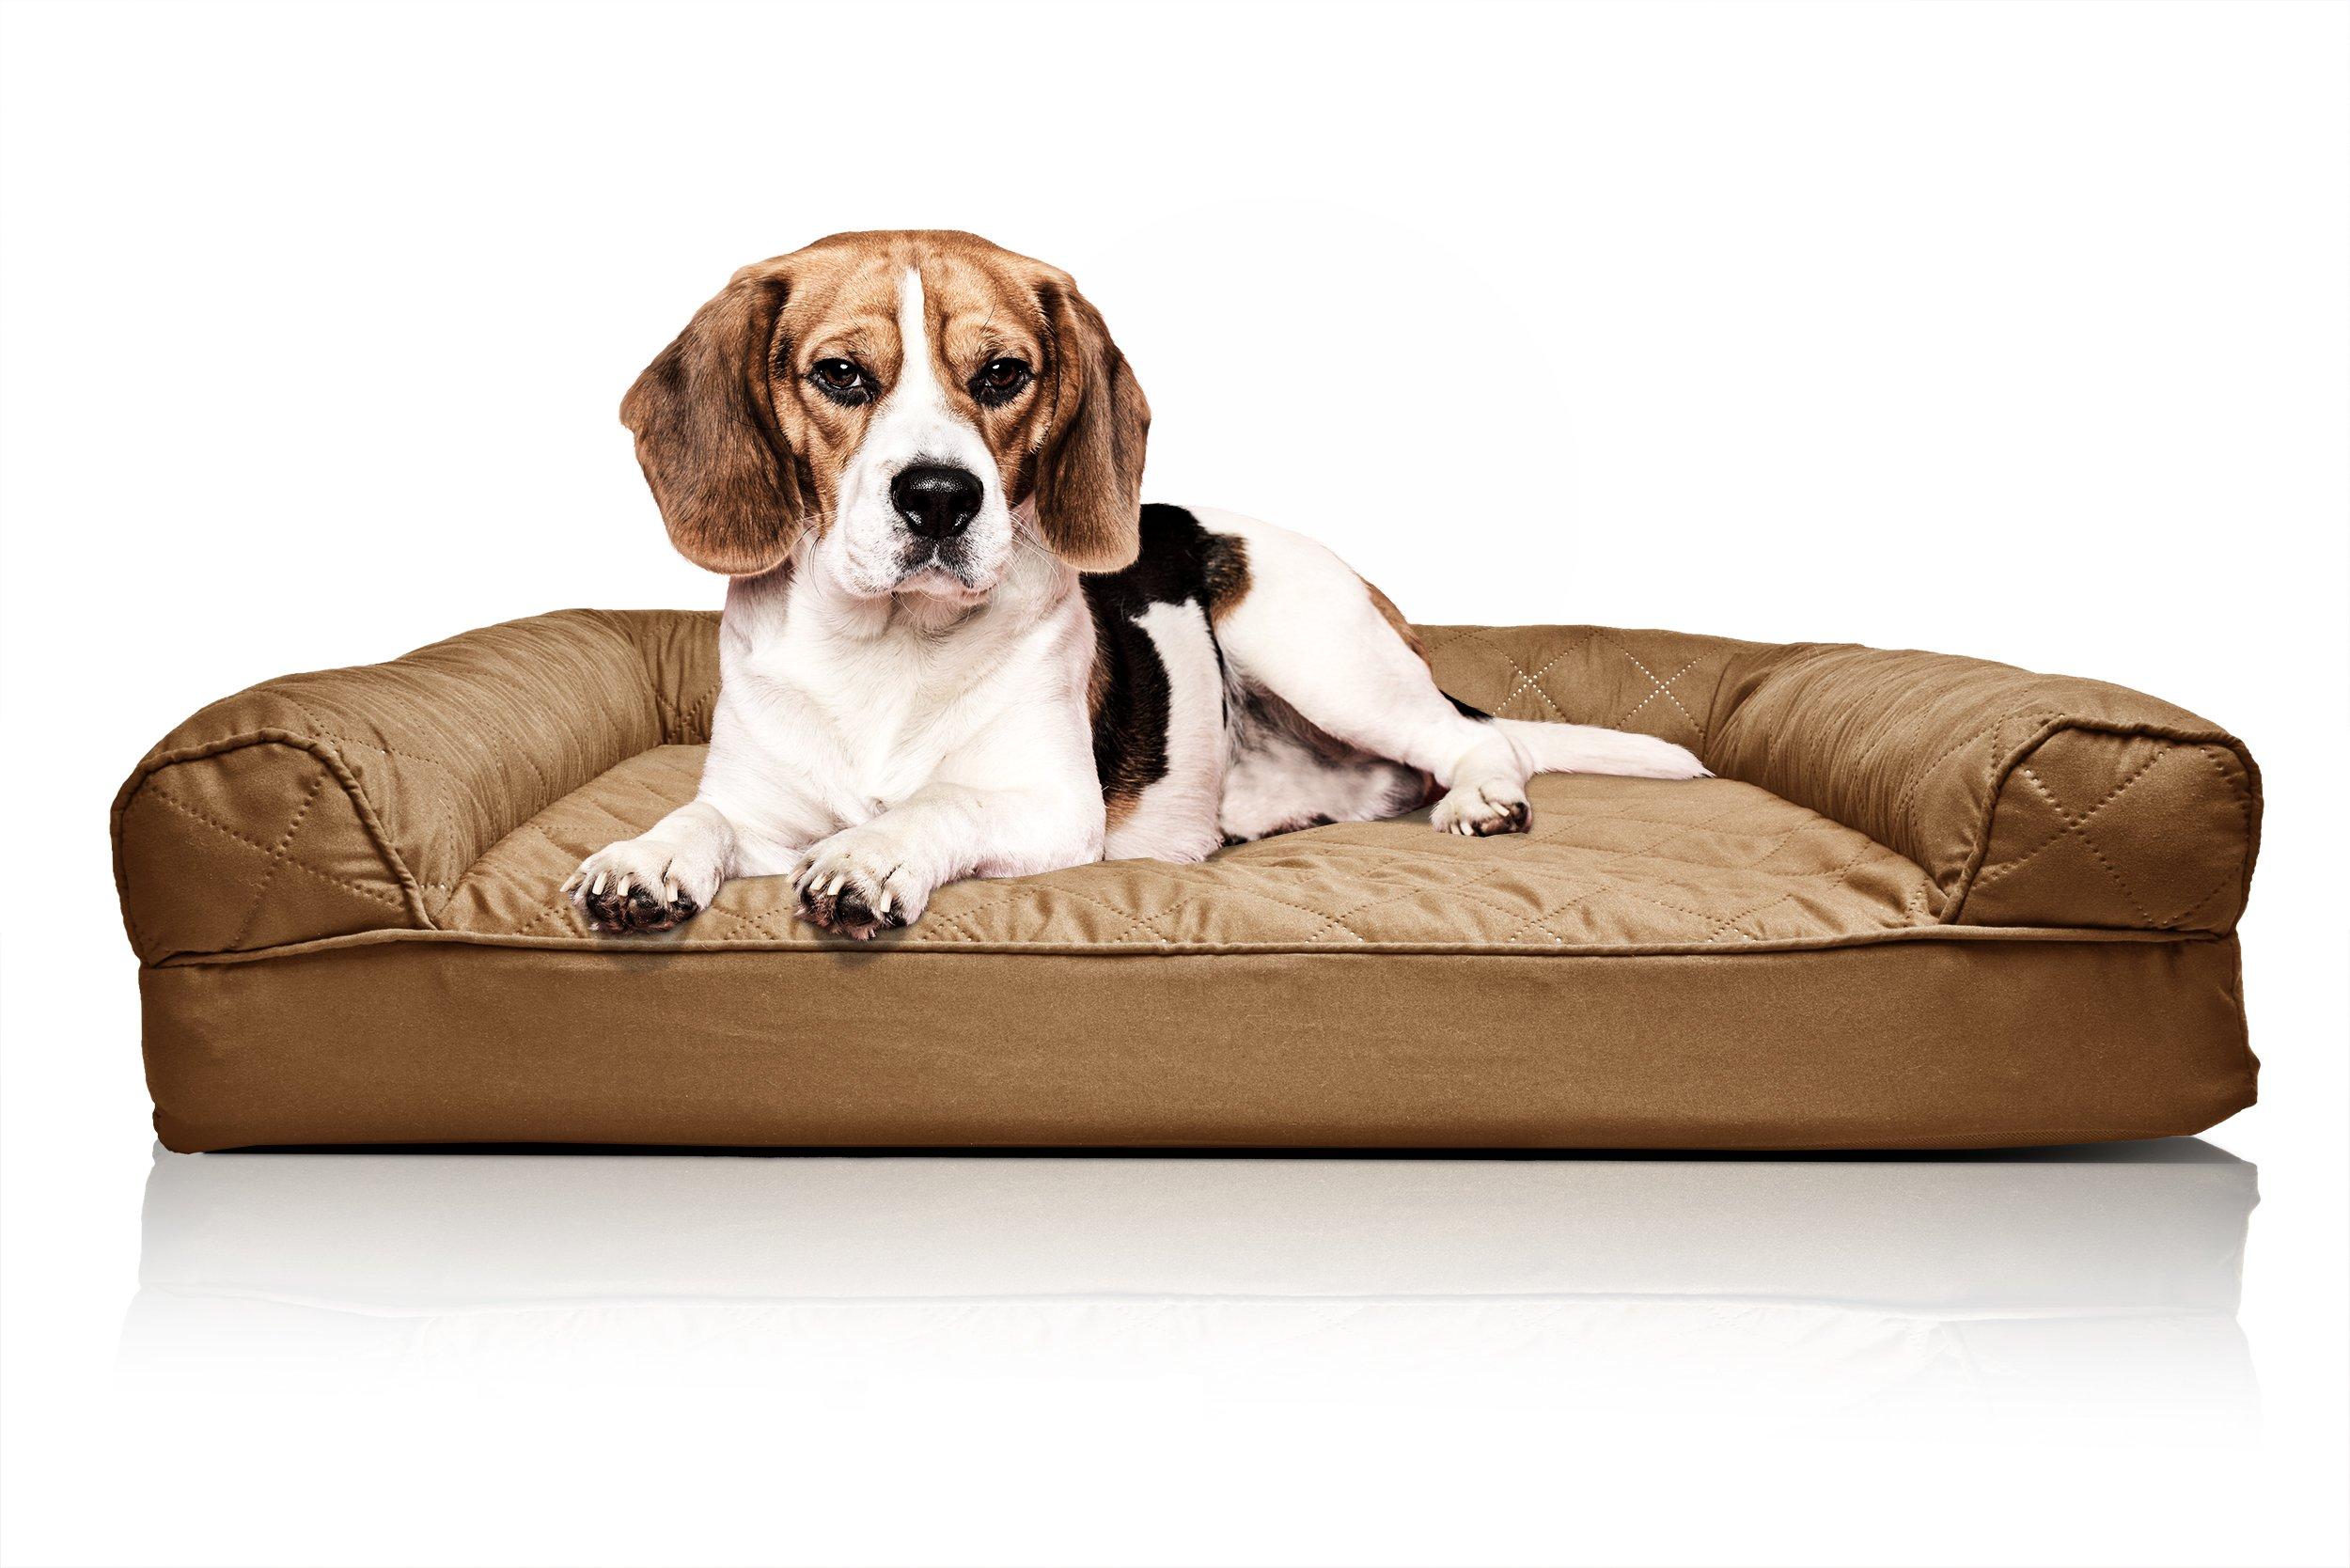 FurHaven Orthopedic Dog Sofa Bed Pet Bed Warm Brown MEDIUM